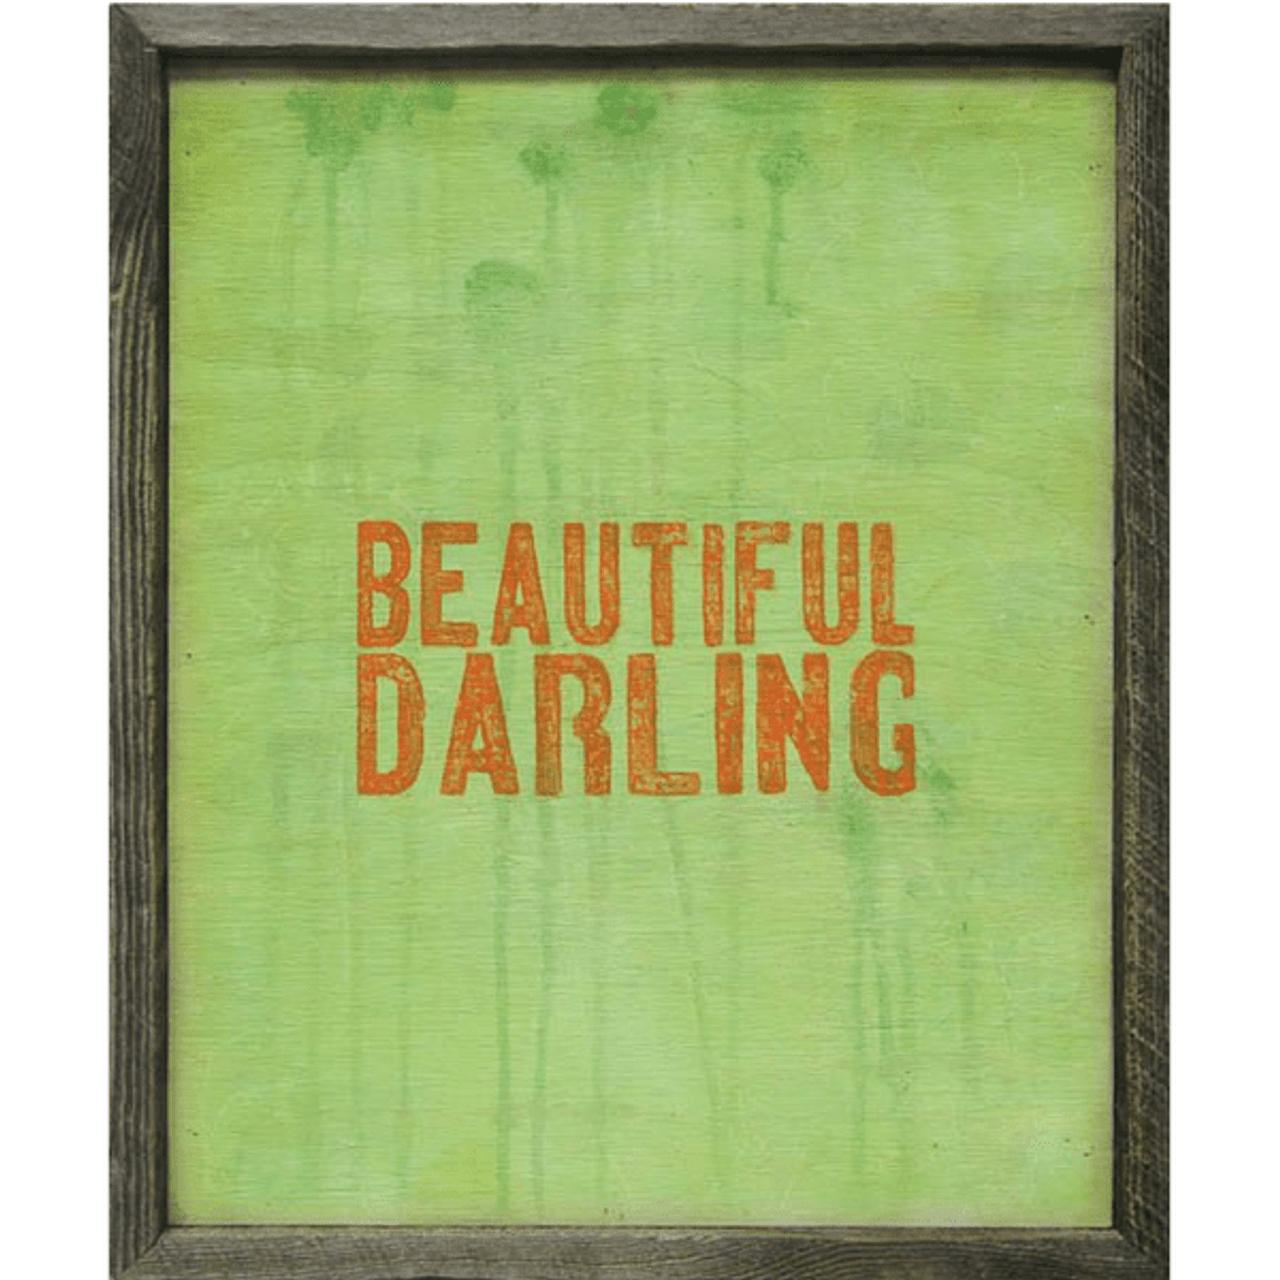 beautiful darling art print - grey background with orange writing with grey wood frame